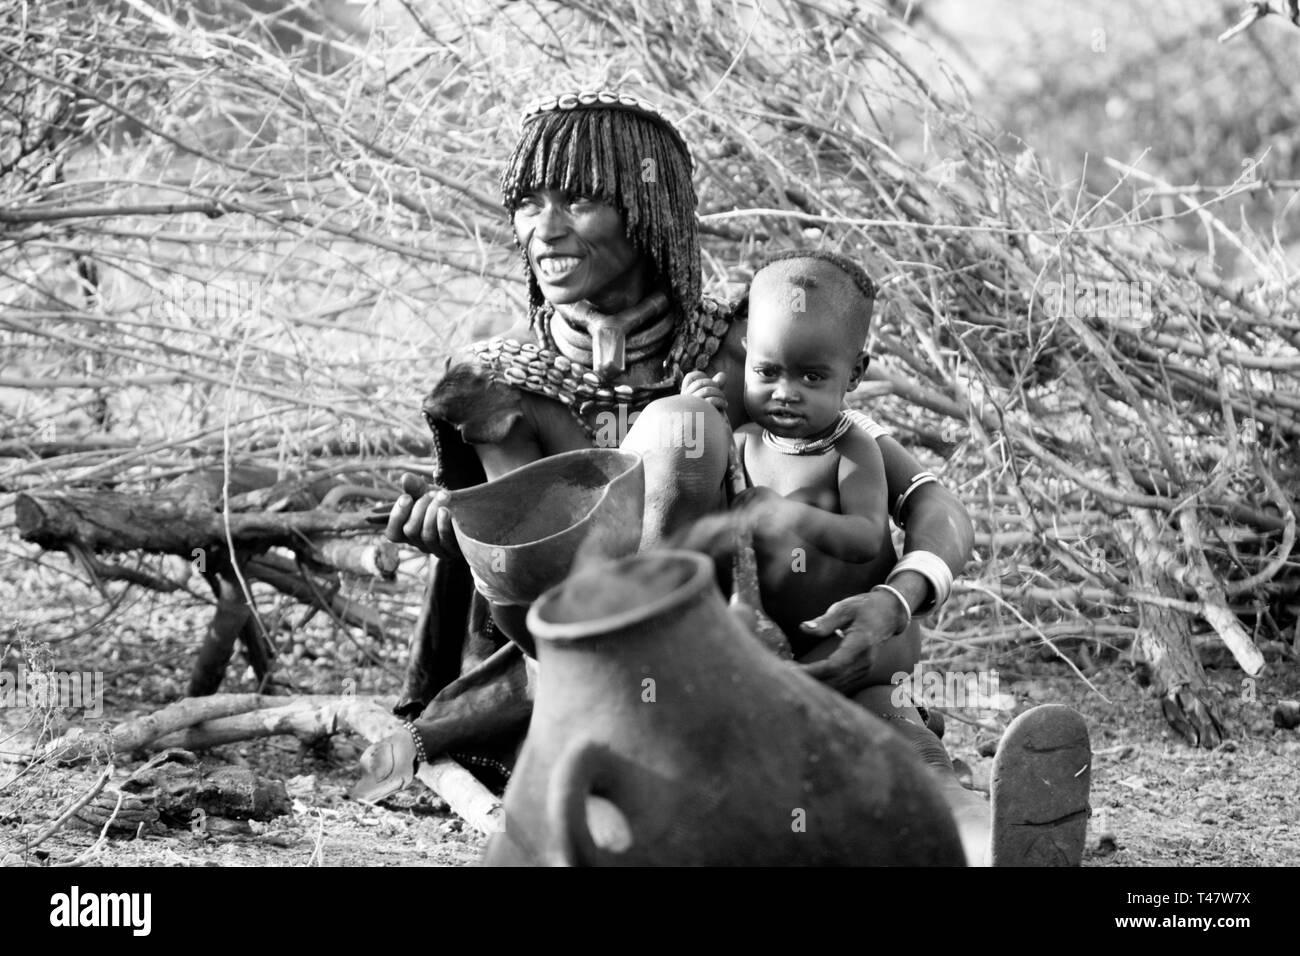 Woman with son, Hamar tribe - Ethiopia © Antonio Ciufo - Stock Image